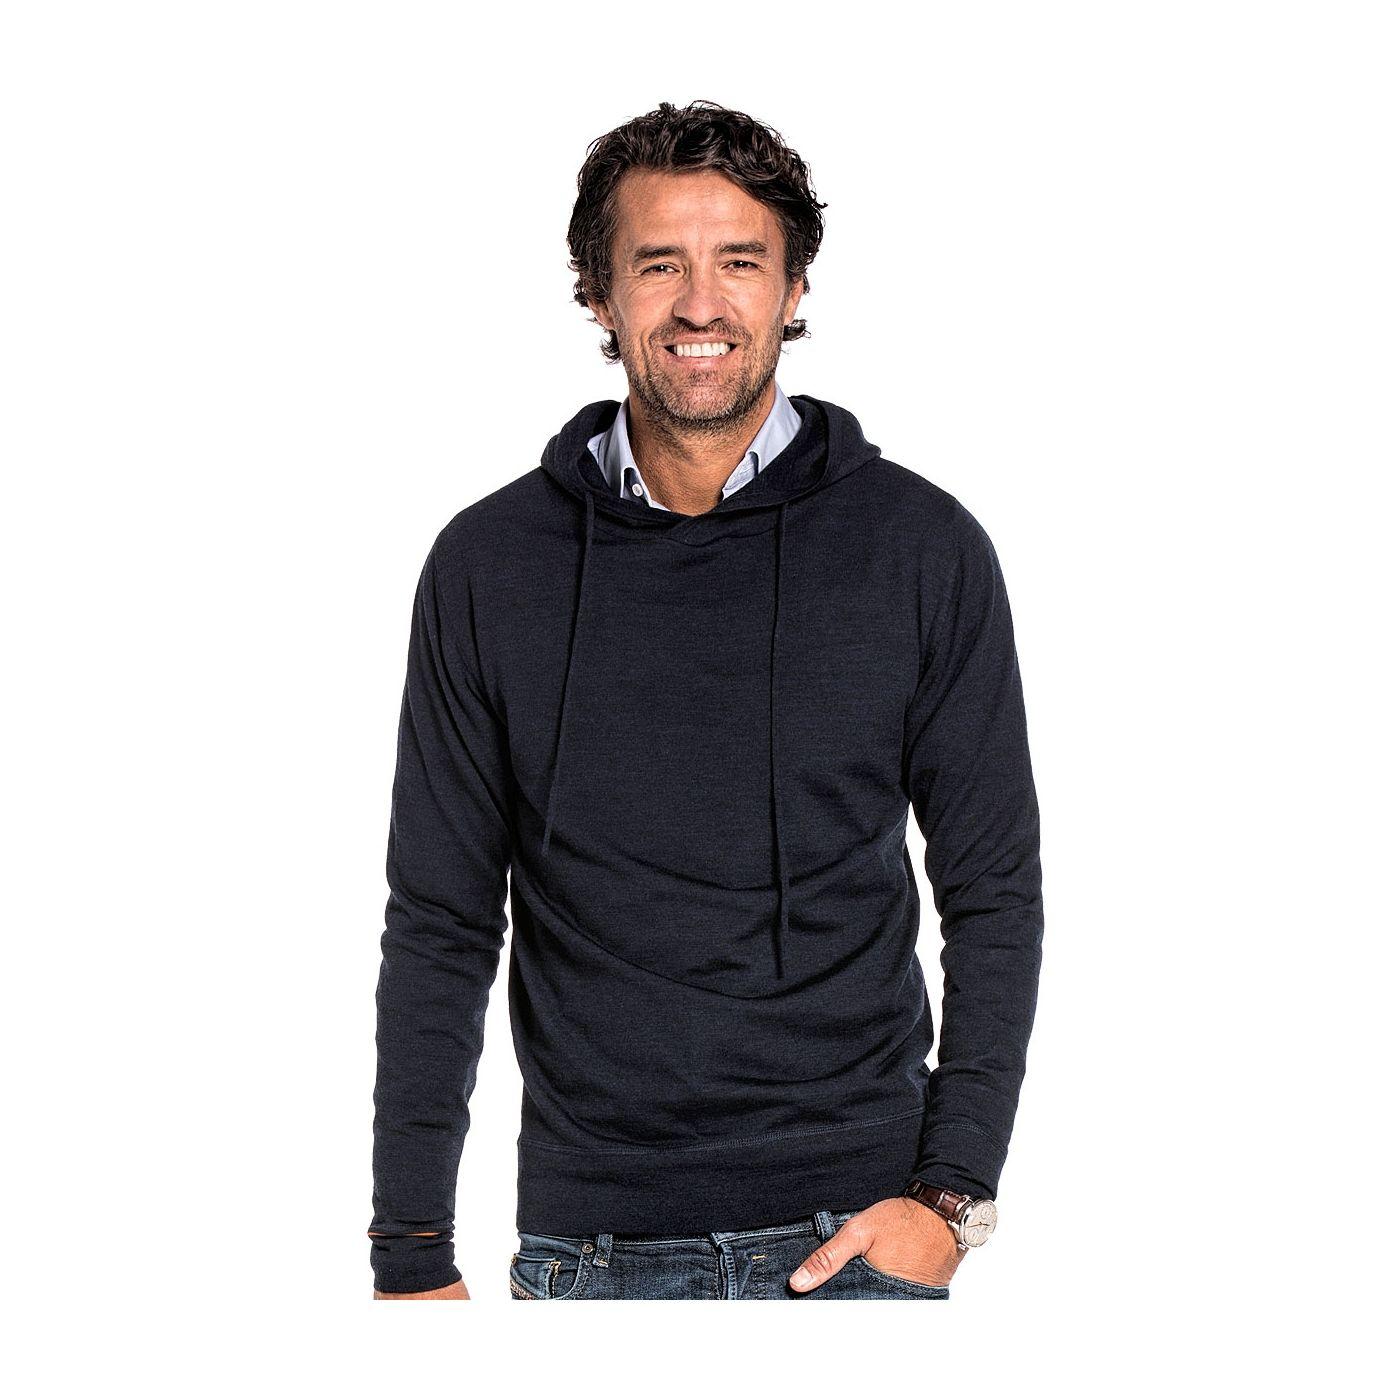 Sweater with hoodie for men made of Merino wool in Dark blue